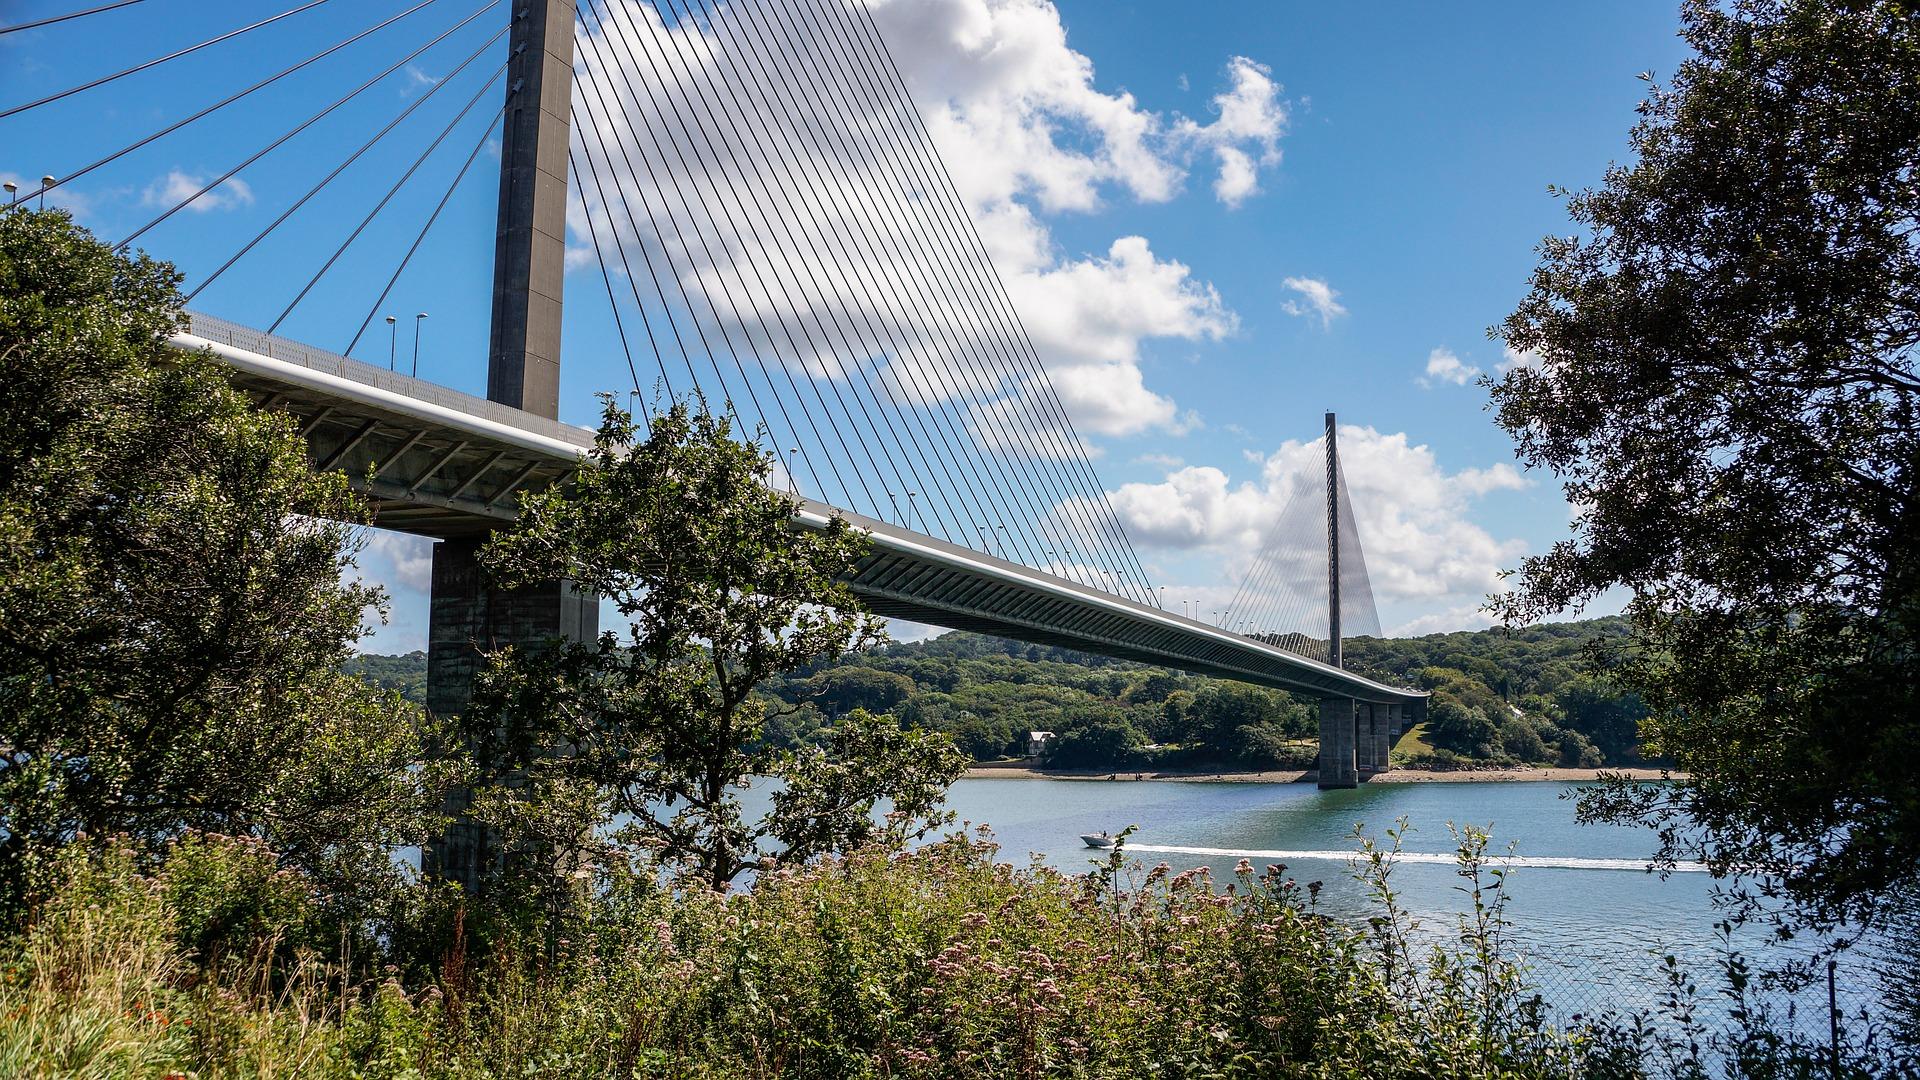 BREST bridge-539668_1920